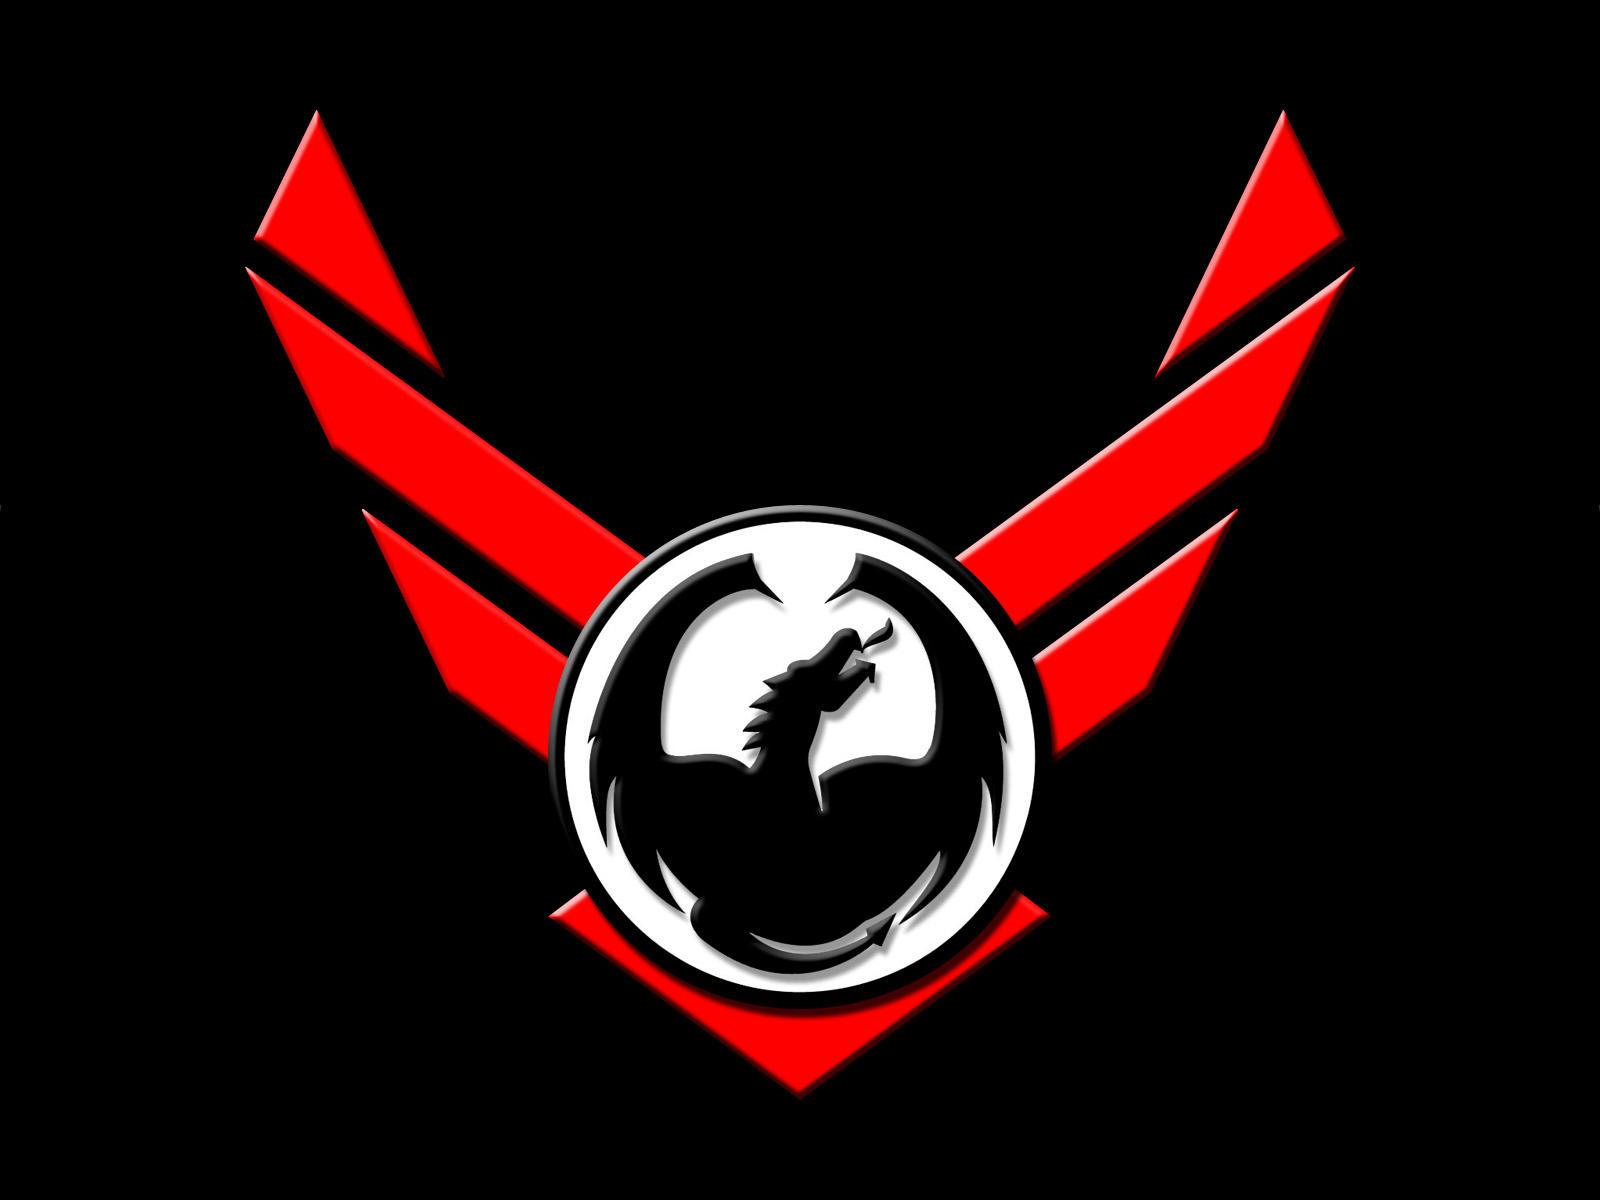 Amazing Wallpaper Logo Dragon - dragon_force____embossed_by_fl1p51d3  Pic_227367.jpg